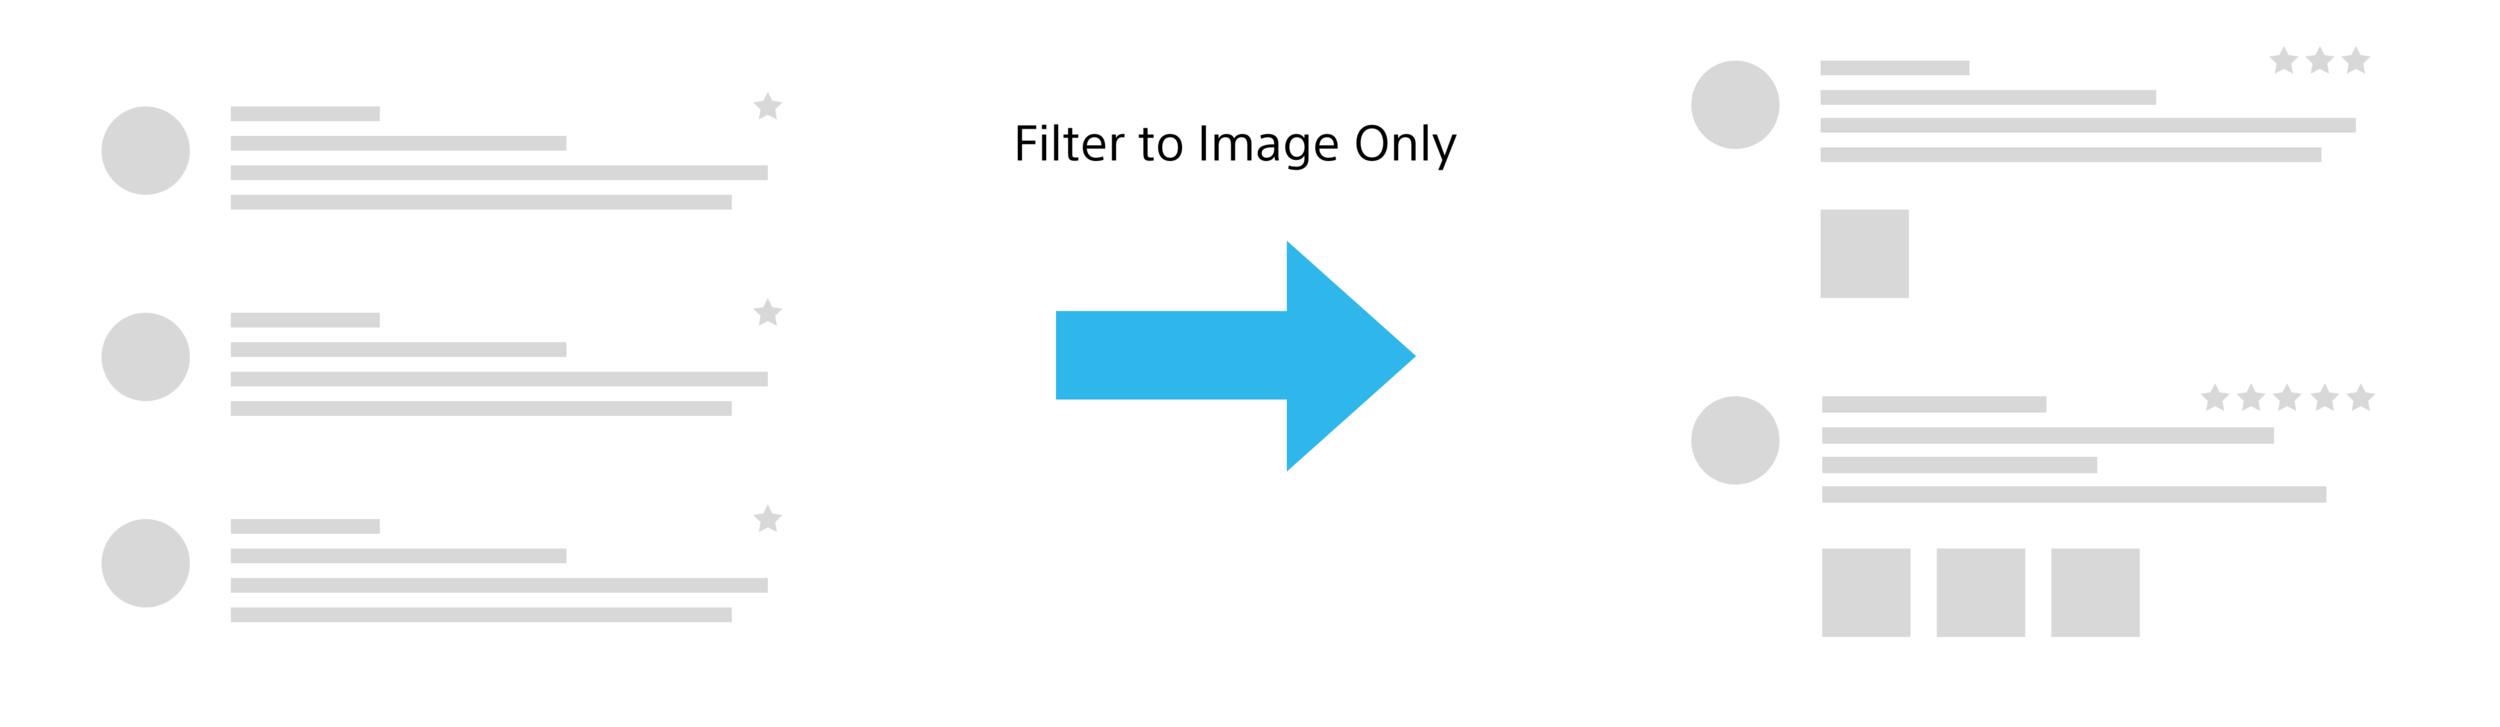 Wish Filter Flow.png